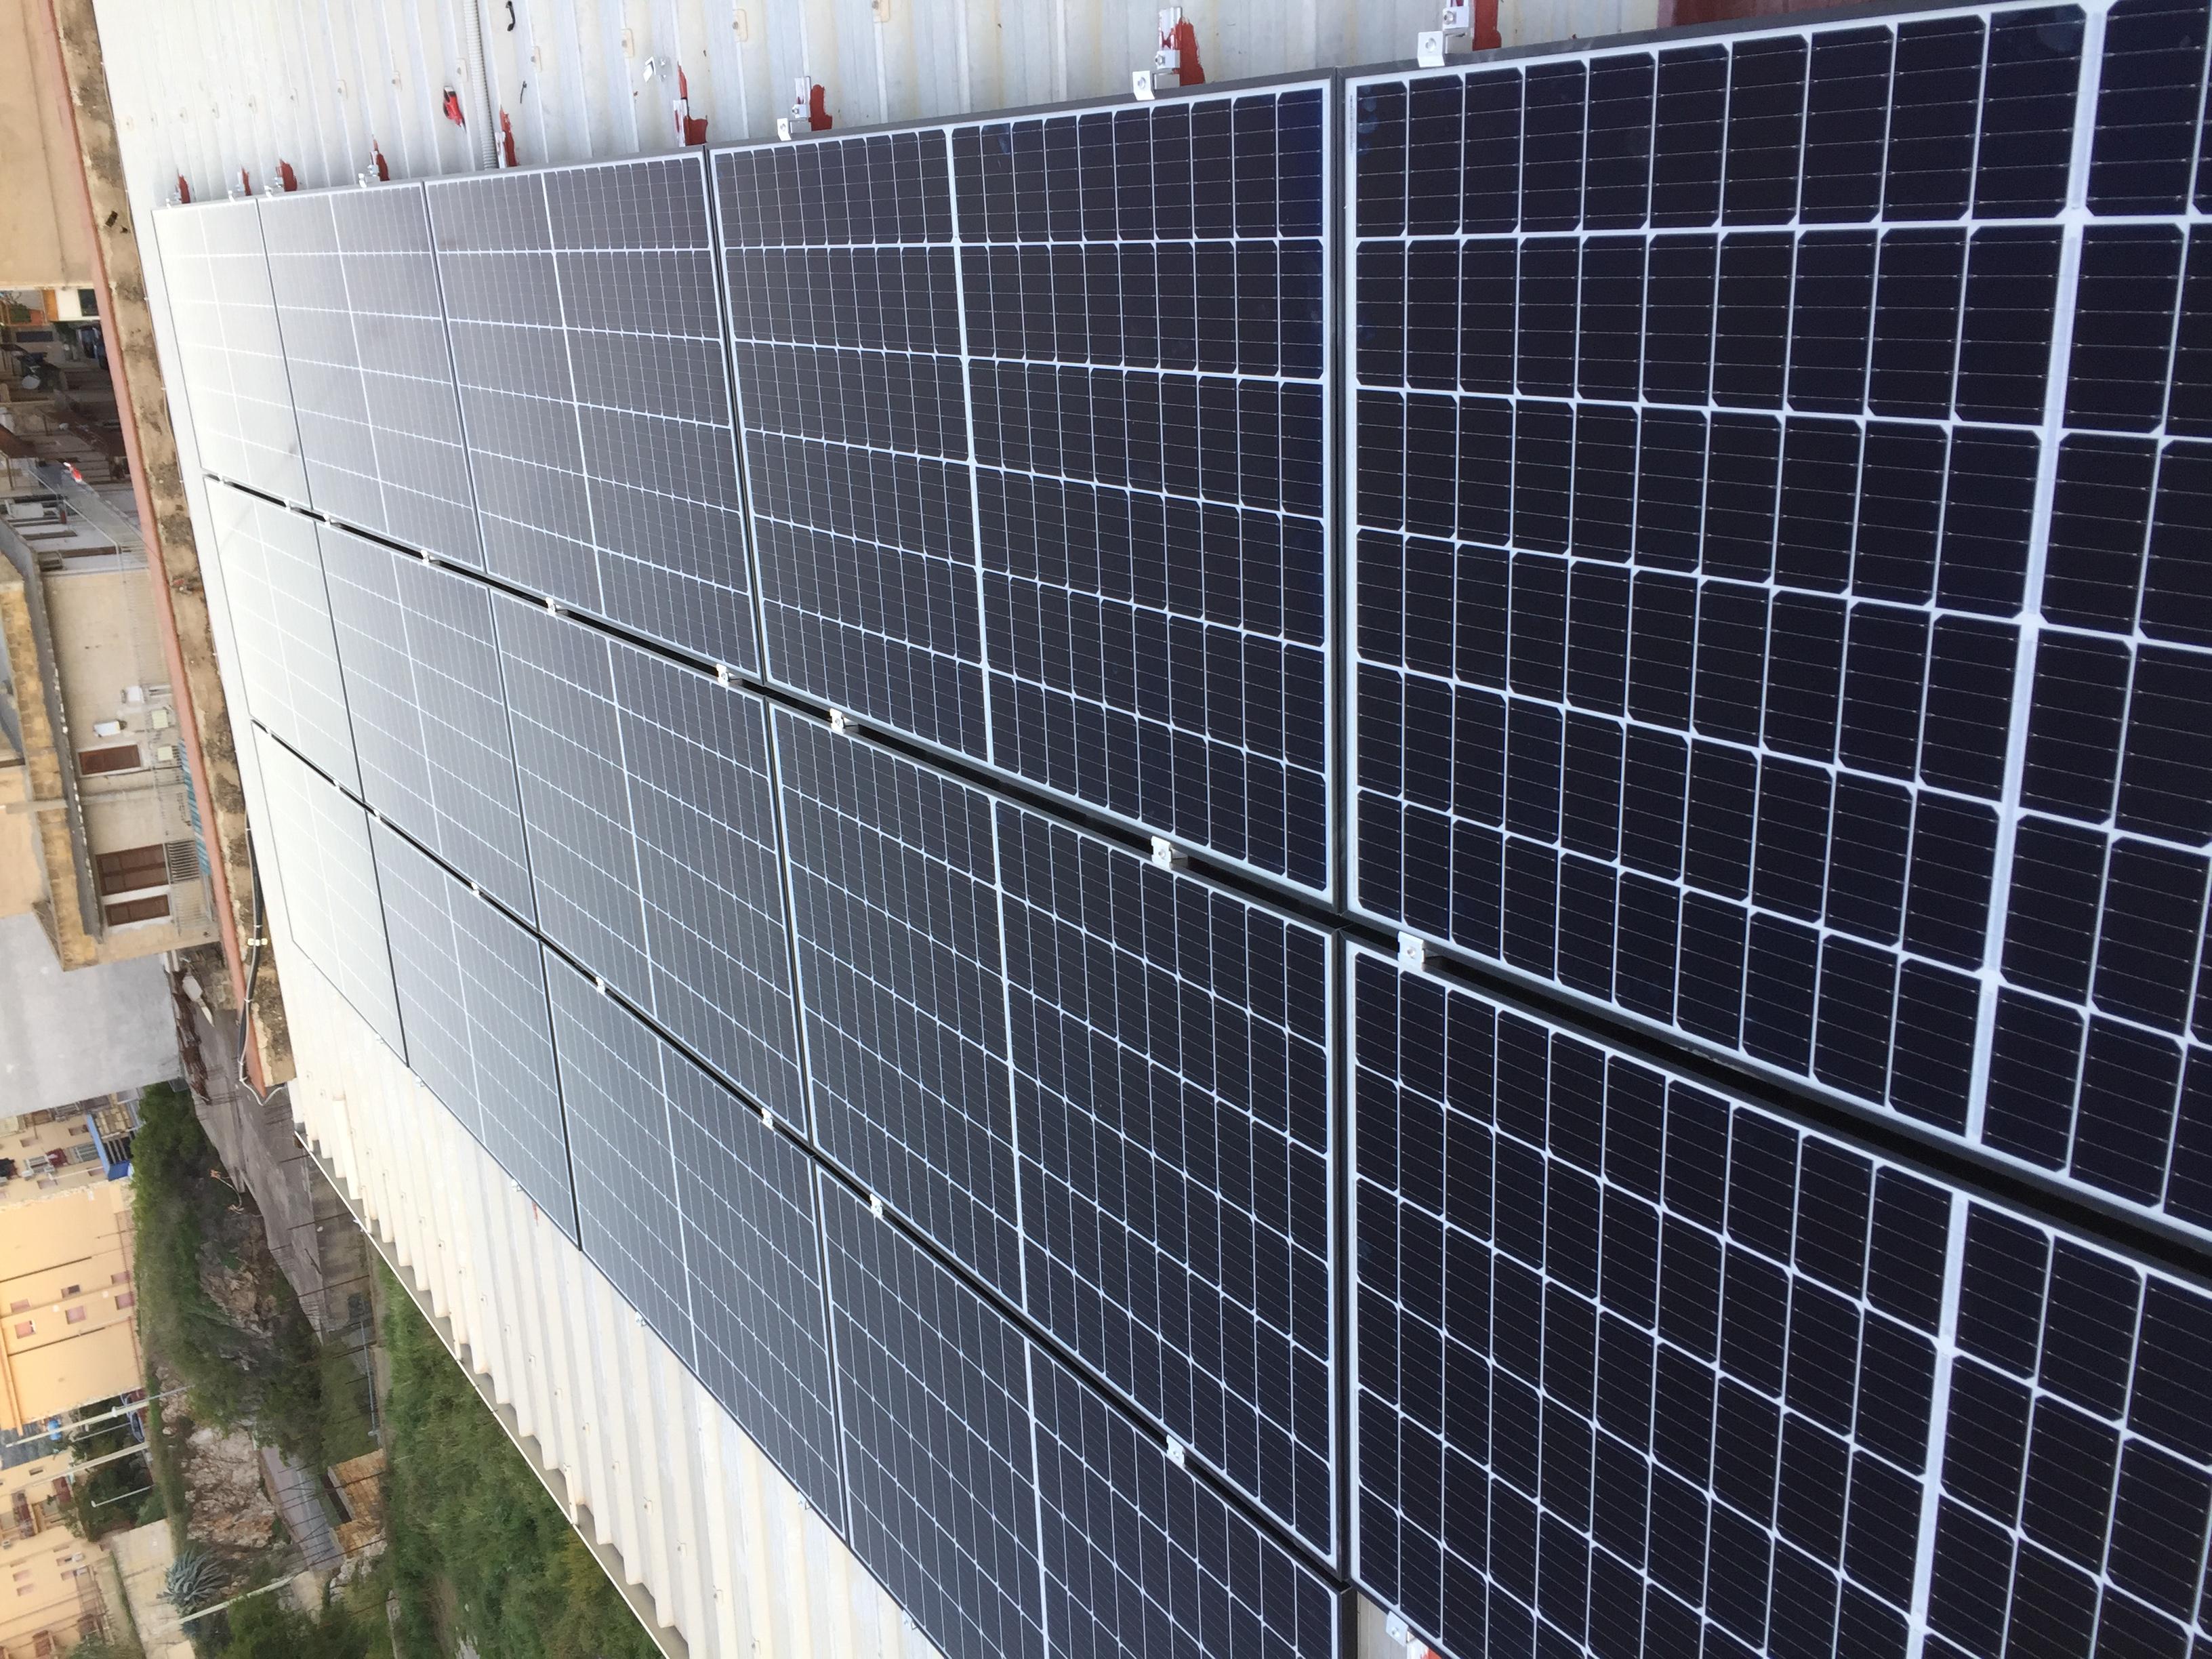 greco_energy_fotovoltaico_sicilia11